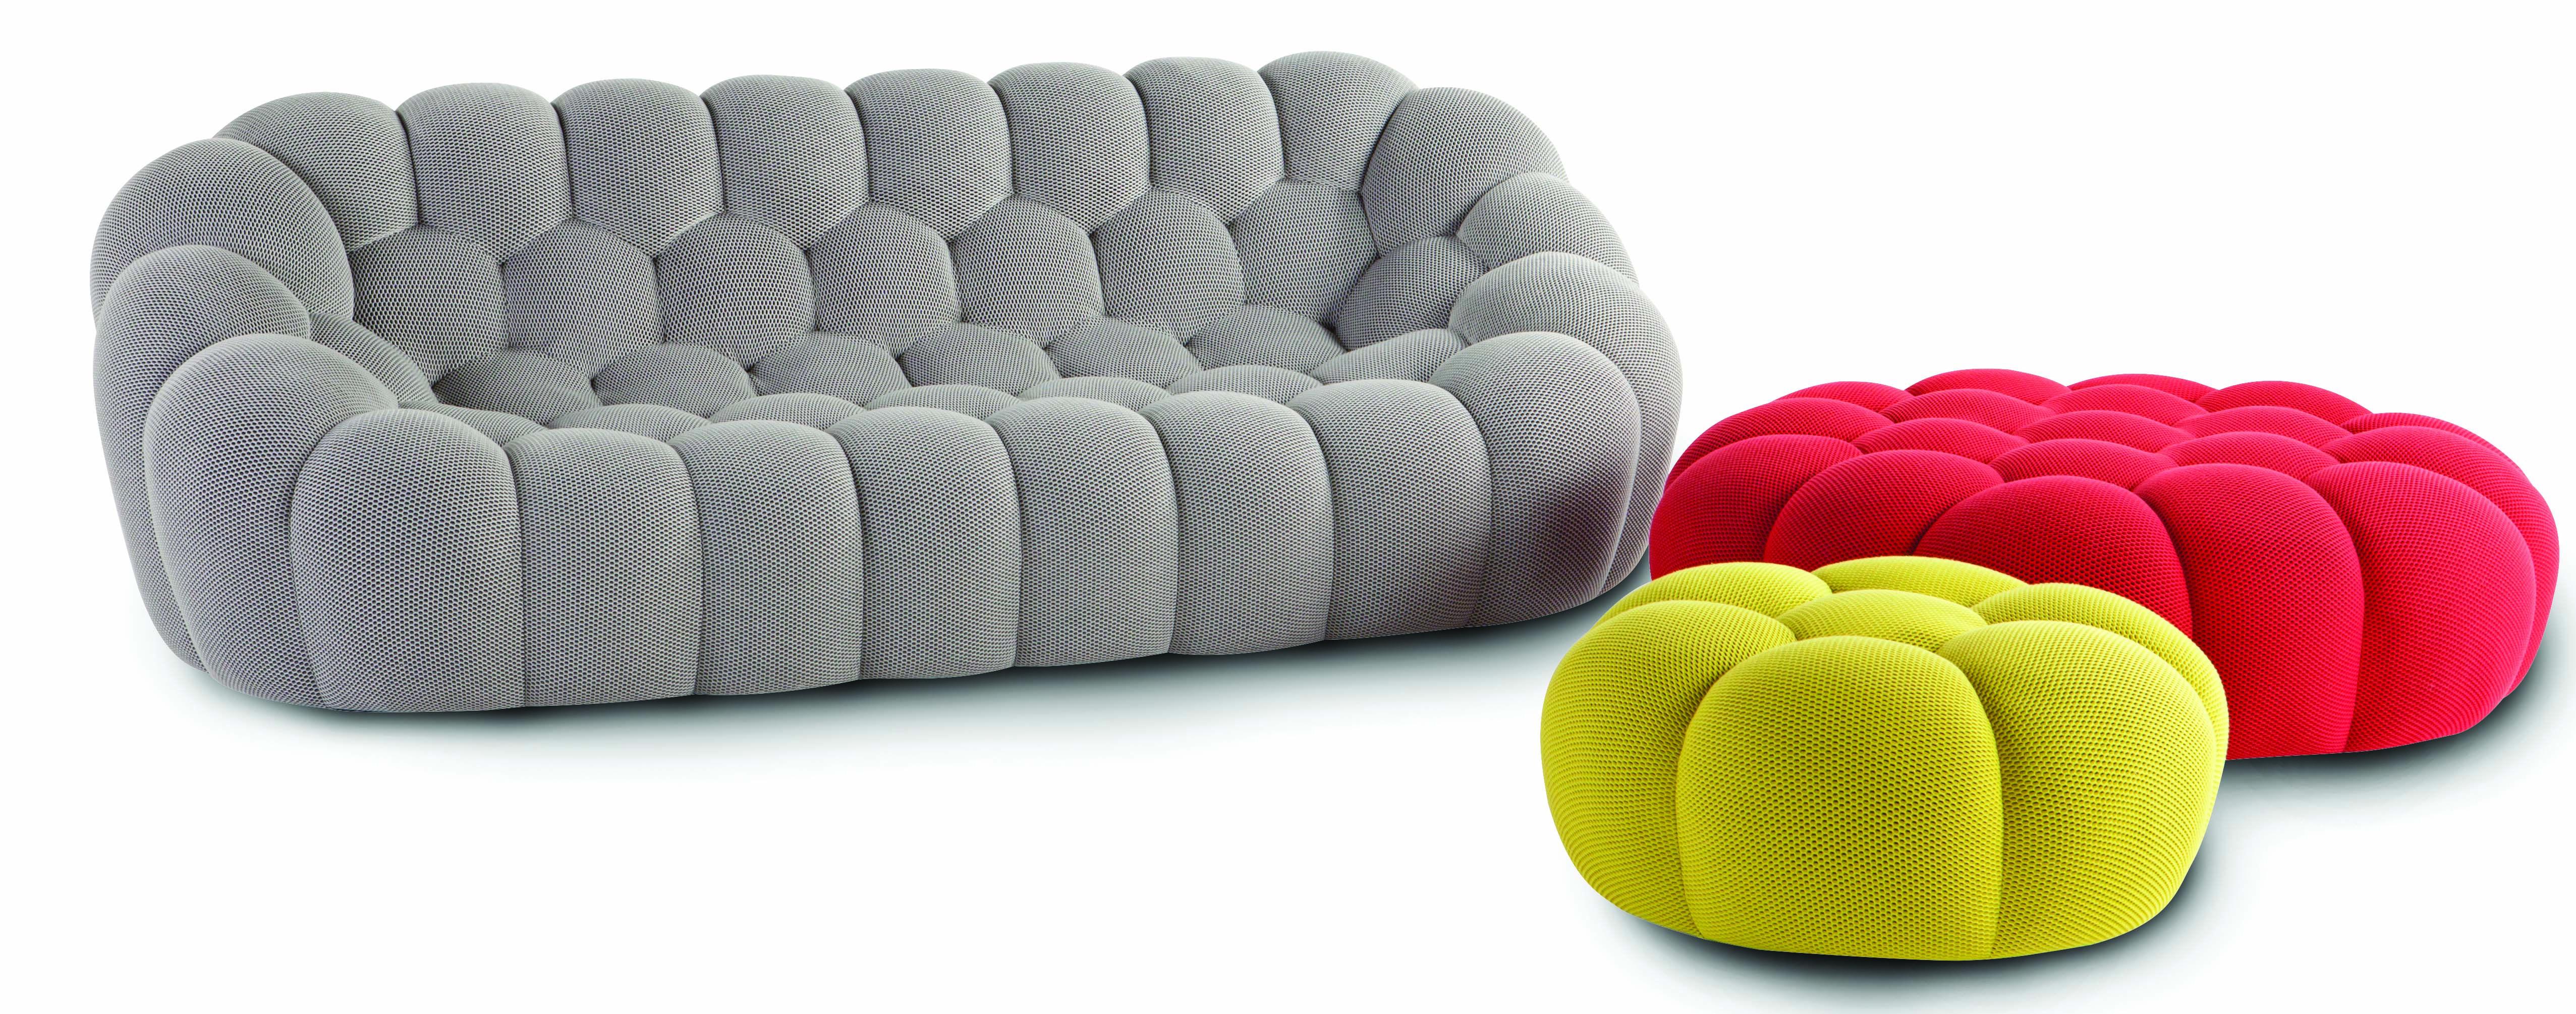 Roche Bobois Bubble Collection Designed By Sacha Lakic